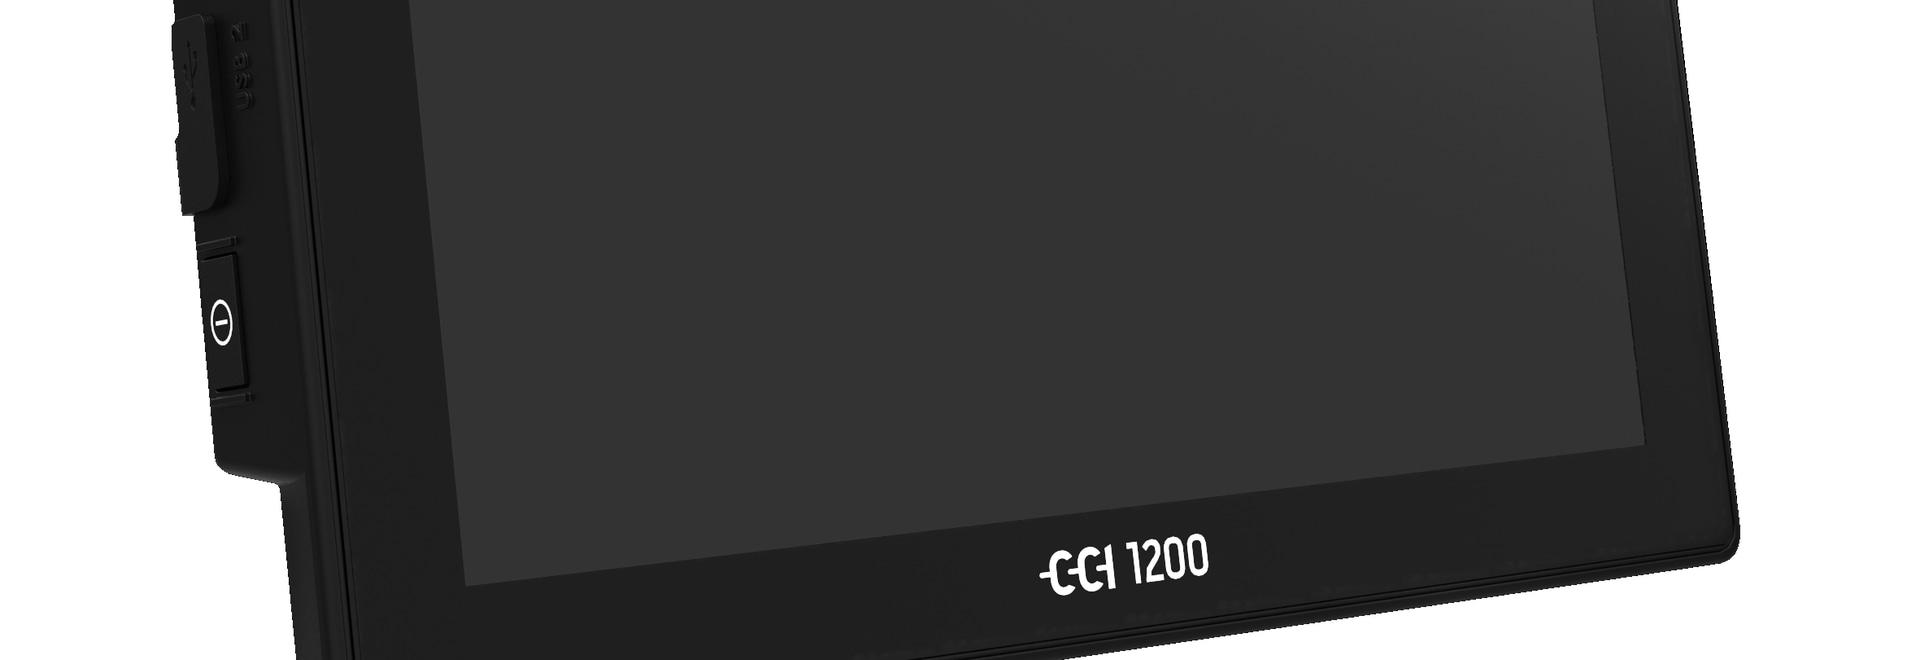 New ISOBUS Terminal CCI 1200